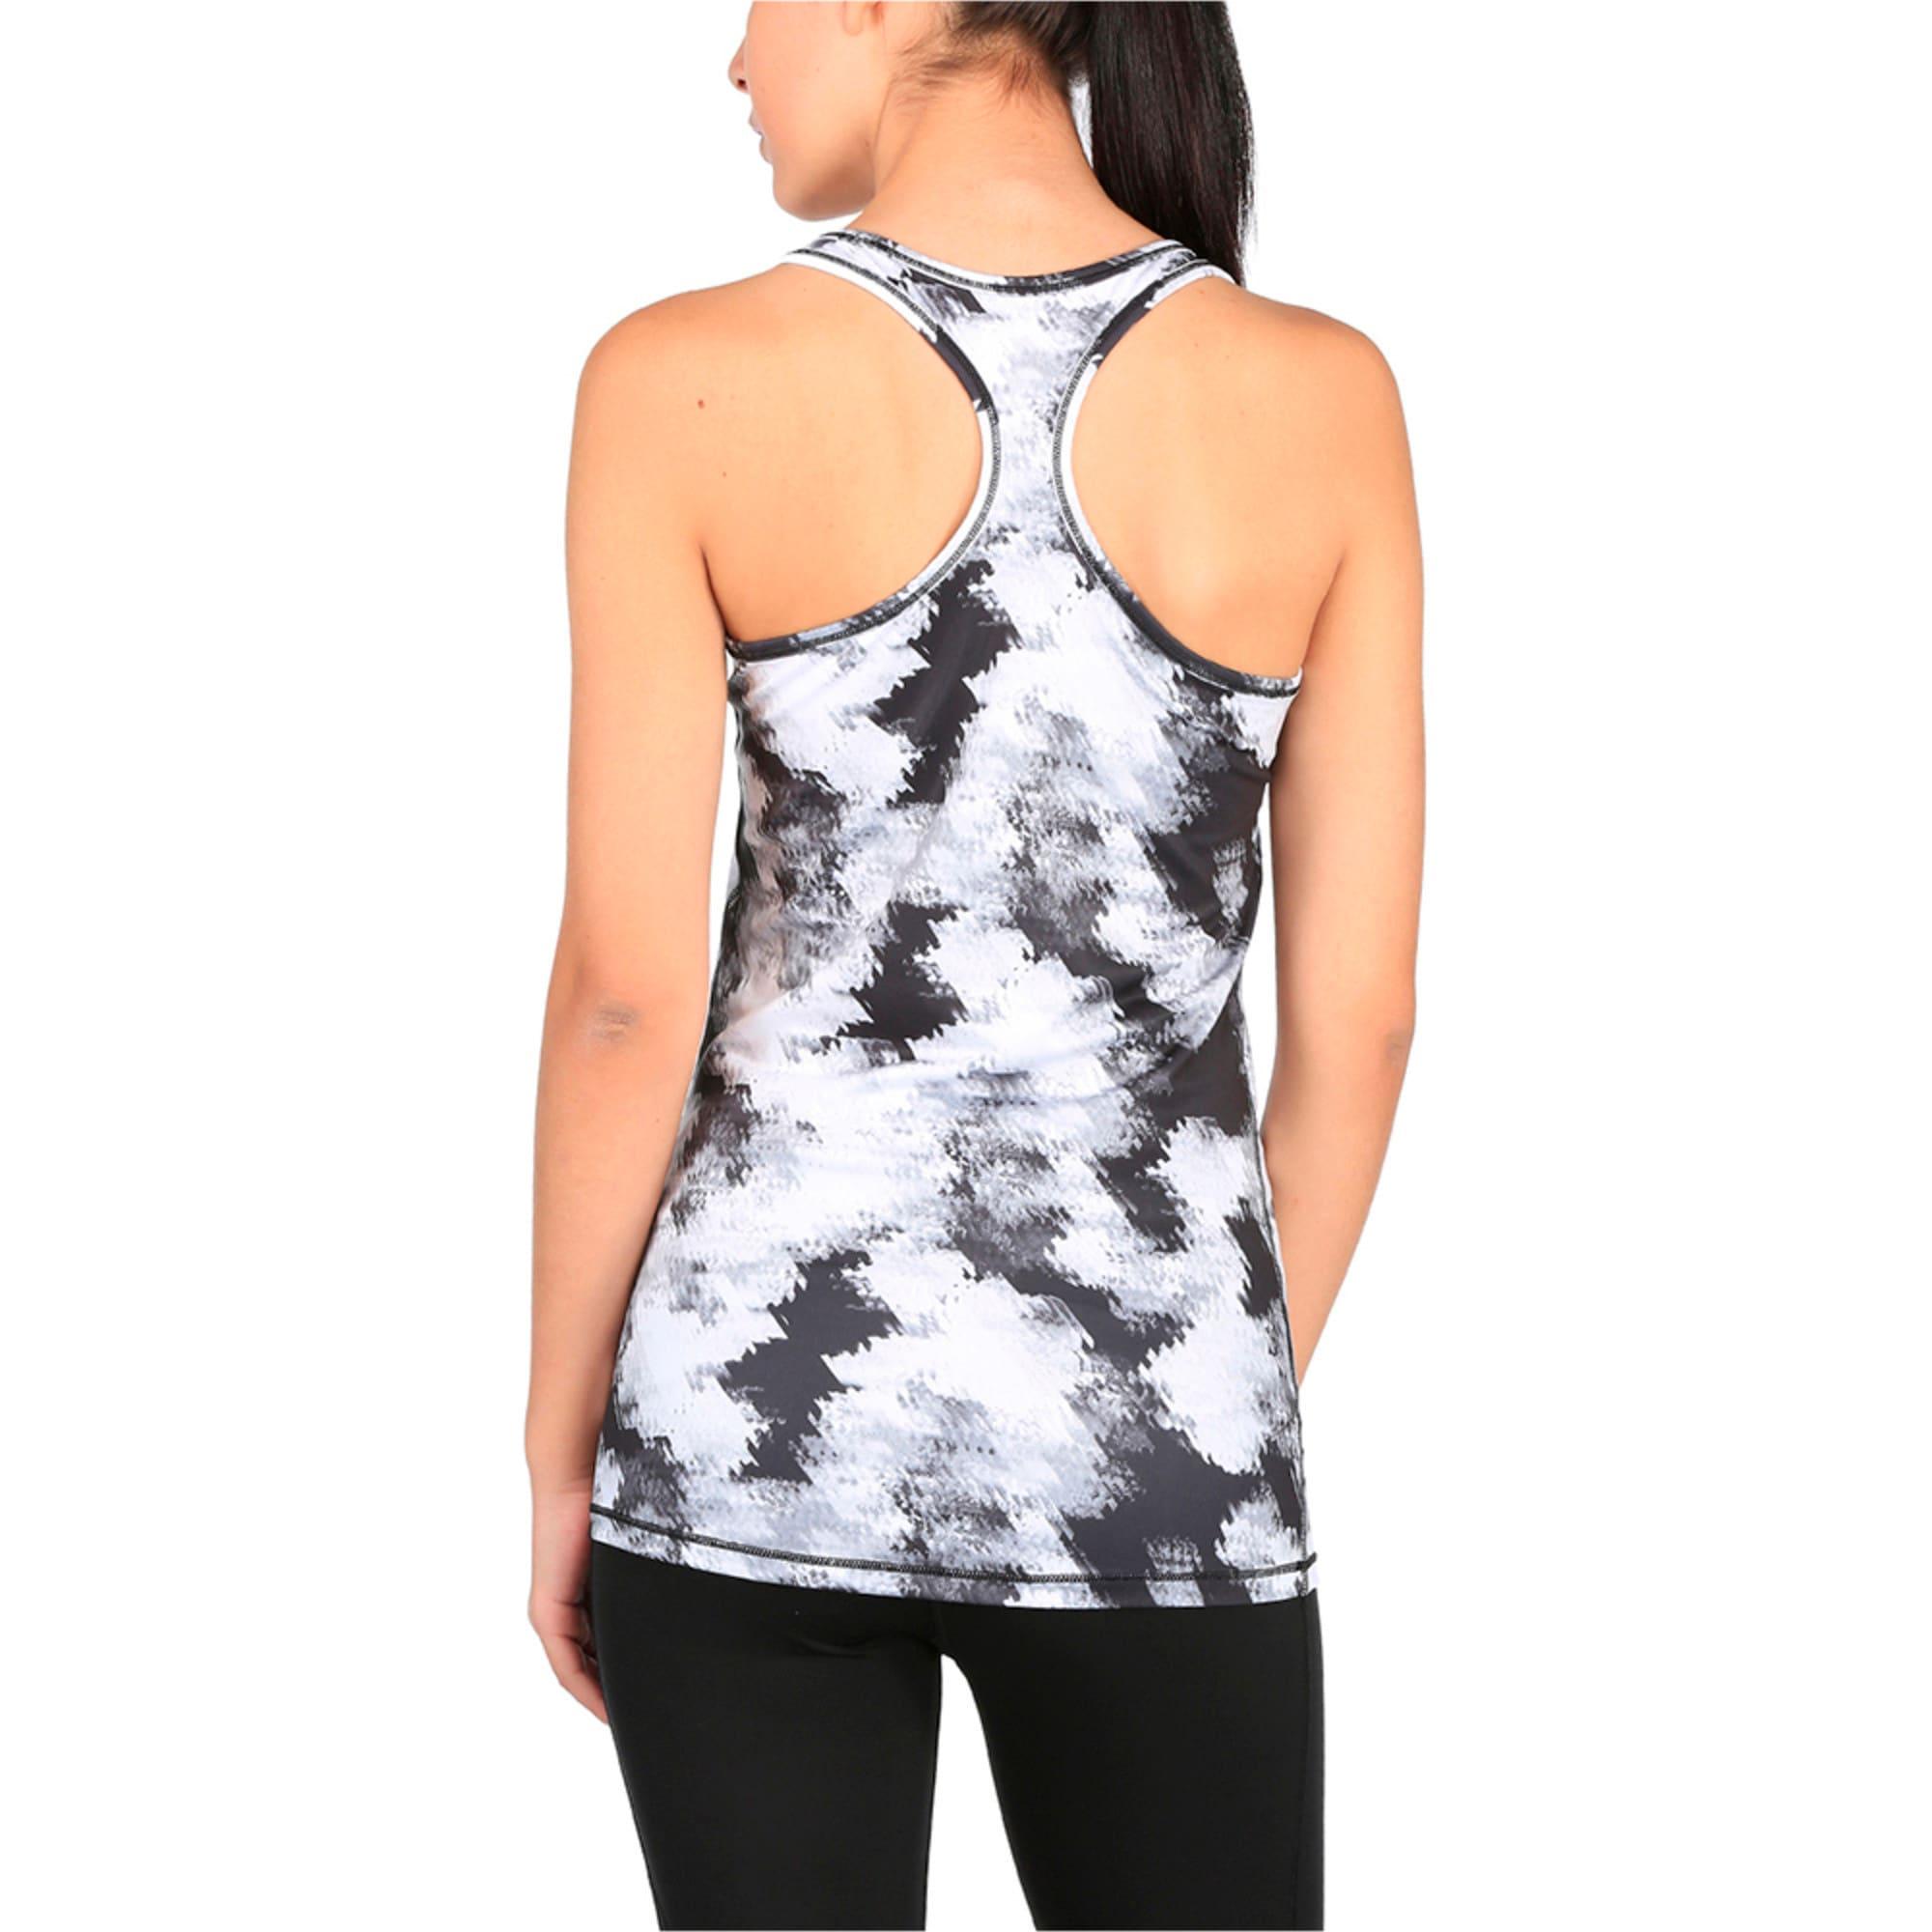 Thumbnail 1 of Training Women's Essential Layer Graphic Tank Top, puma black-white explosv pt, medium-IND